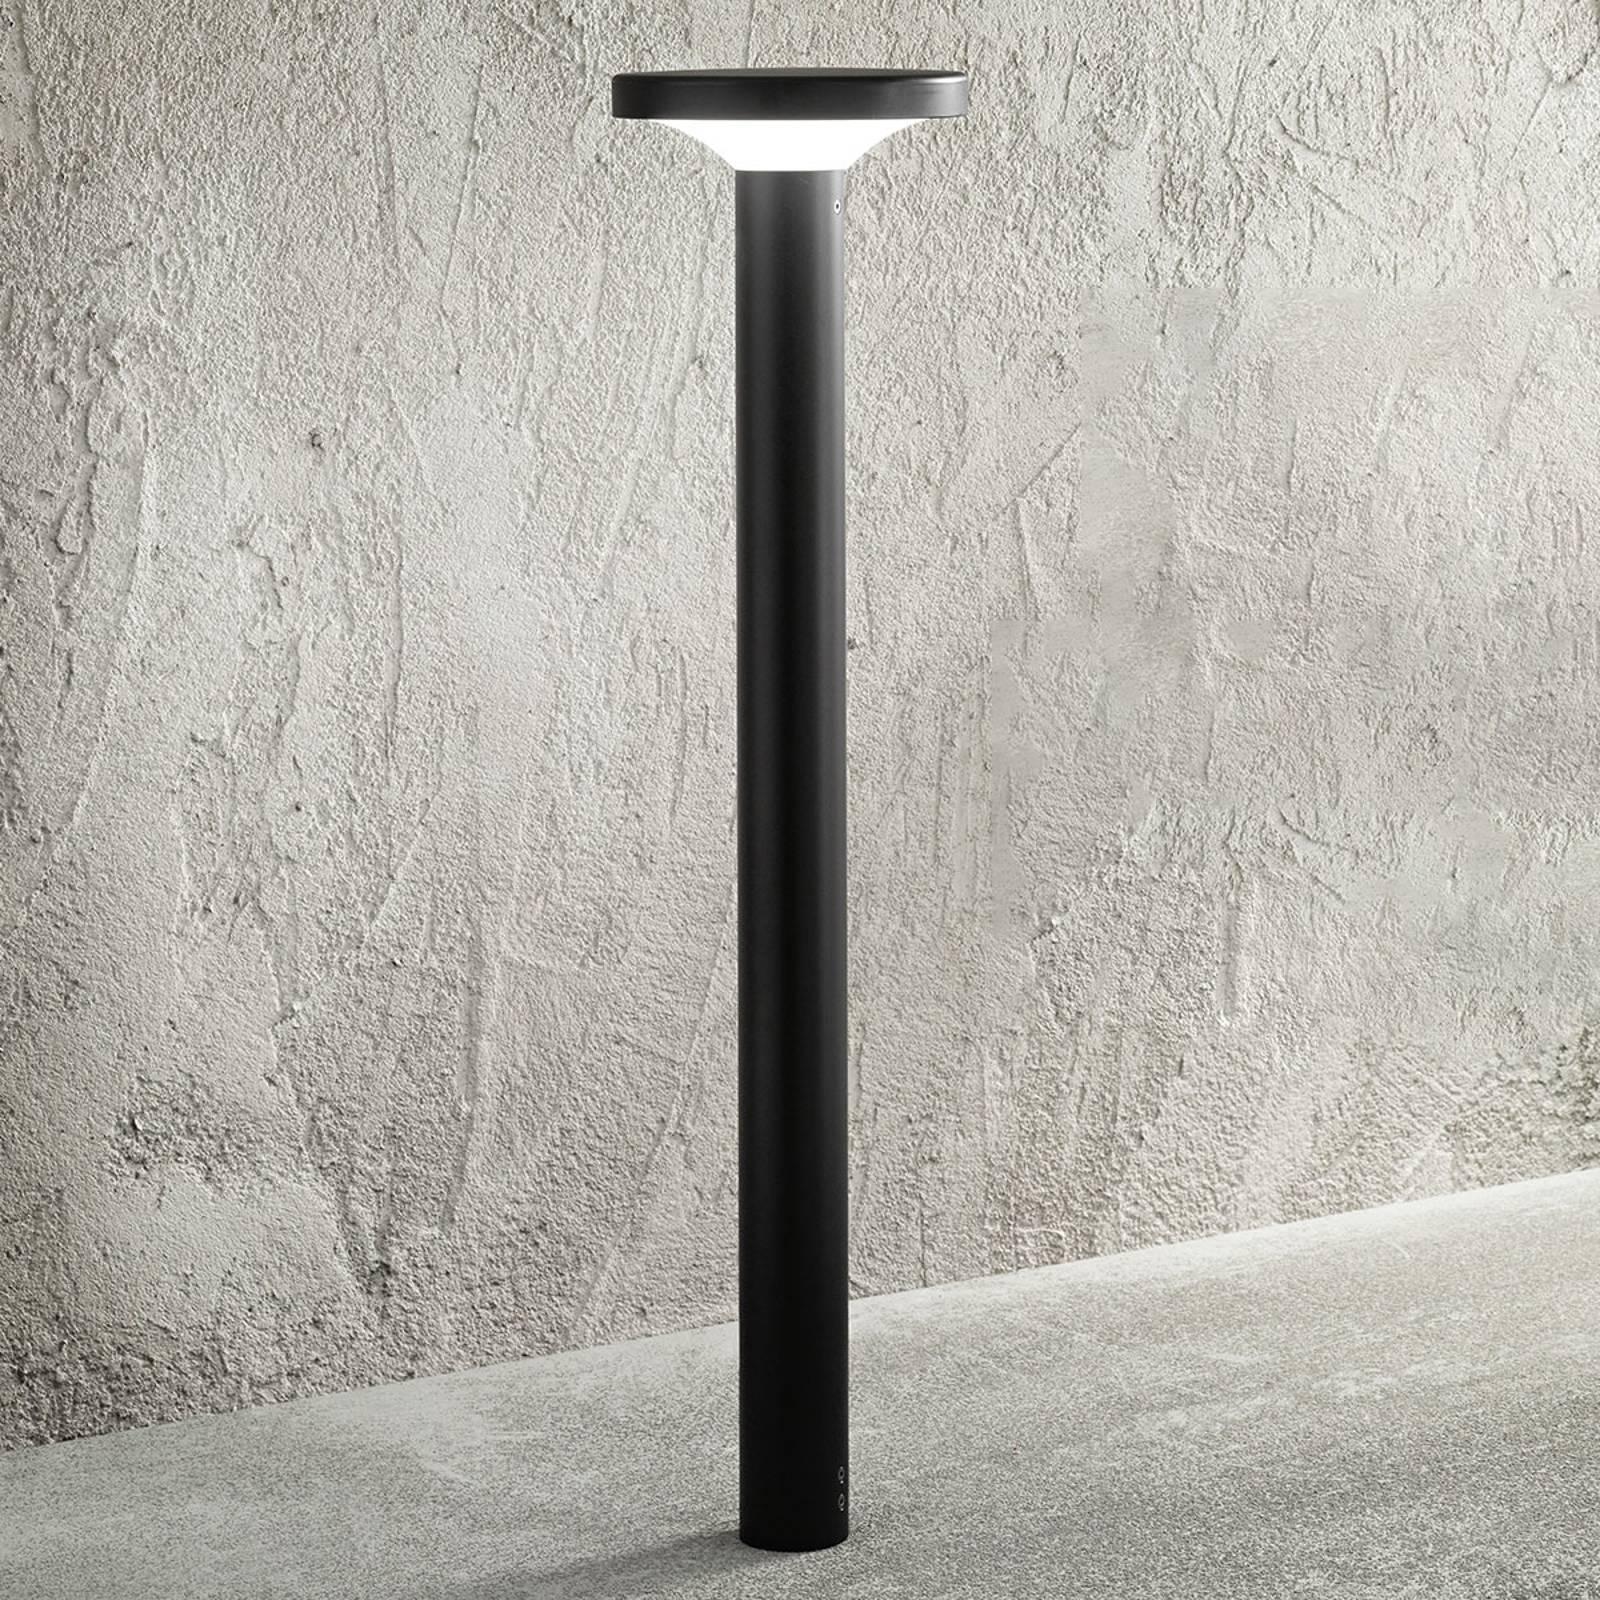 LED-Wegeleuchte MyWhite_Bond in modernem Schwarz